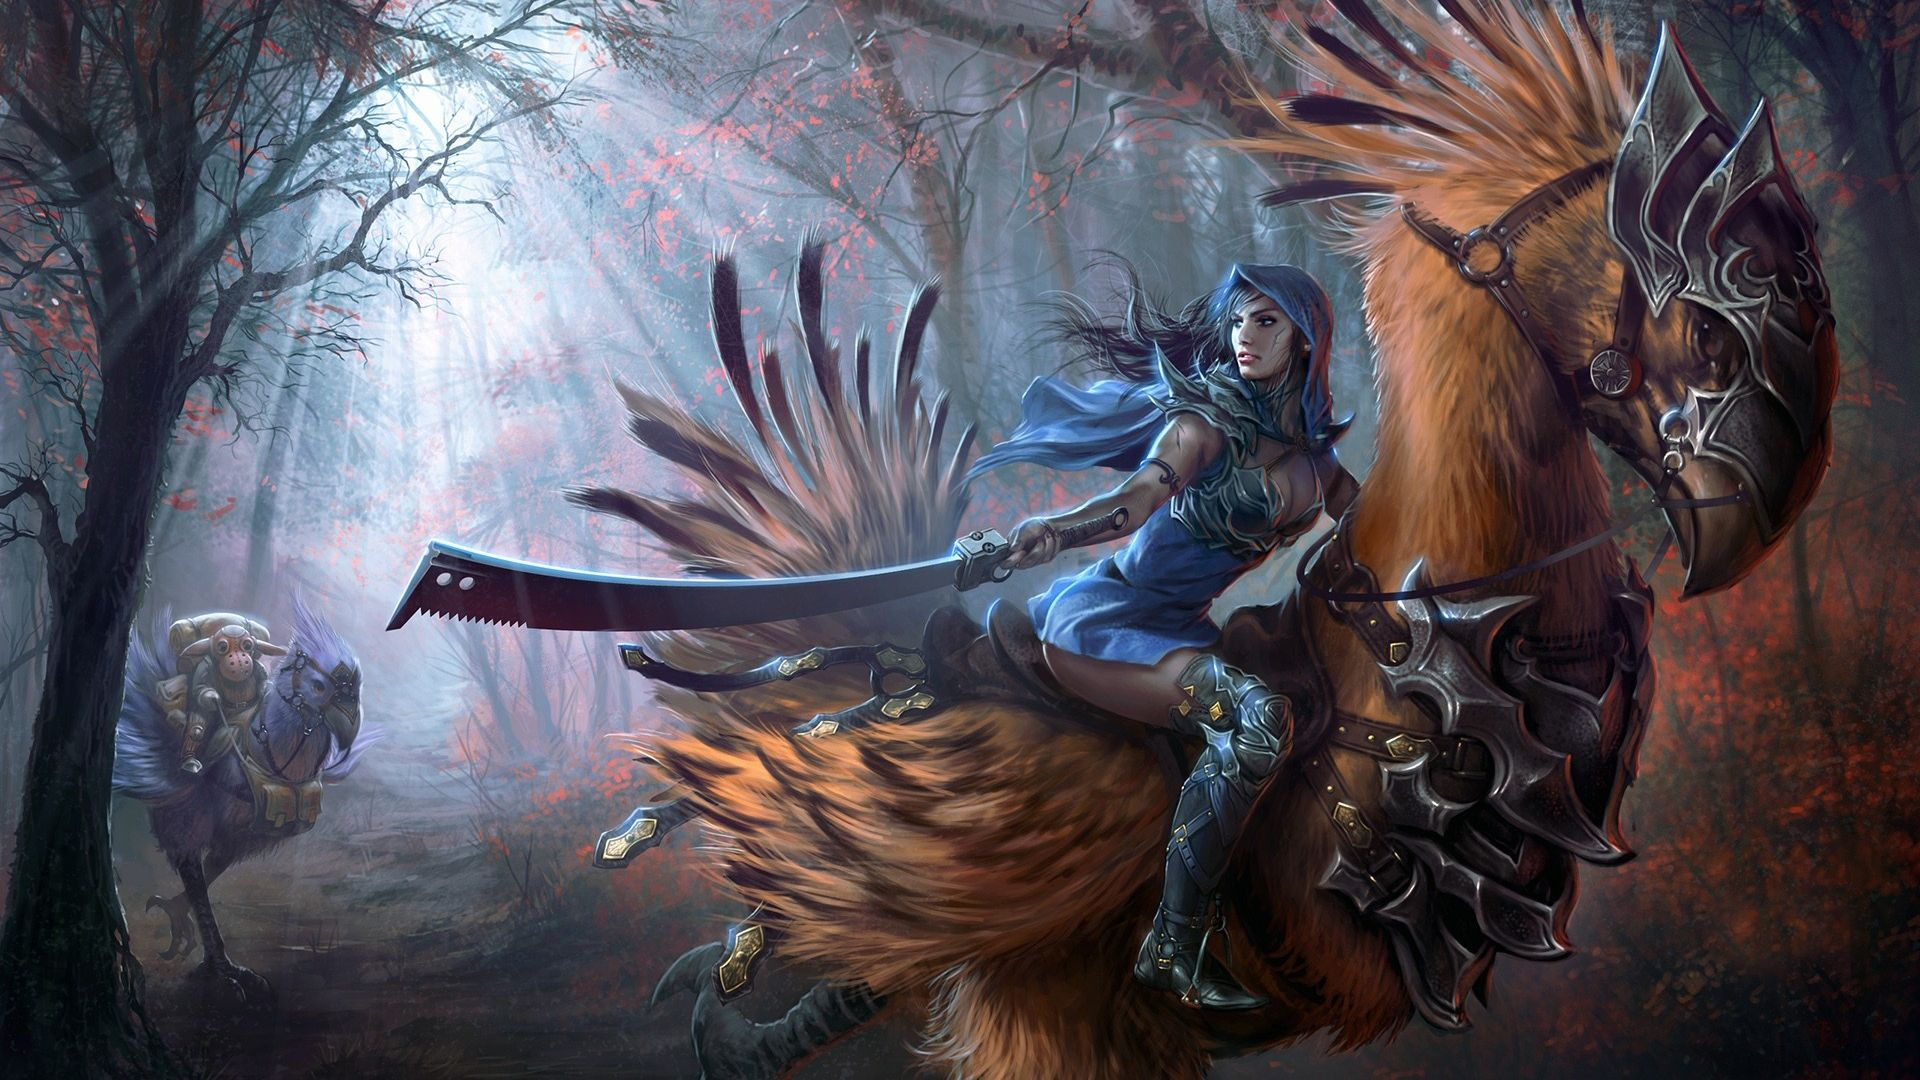 Video Game Final Fantasy Wallpaper Imagenes De Arte Arte De